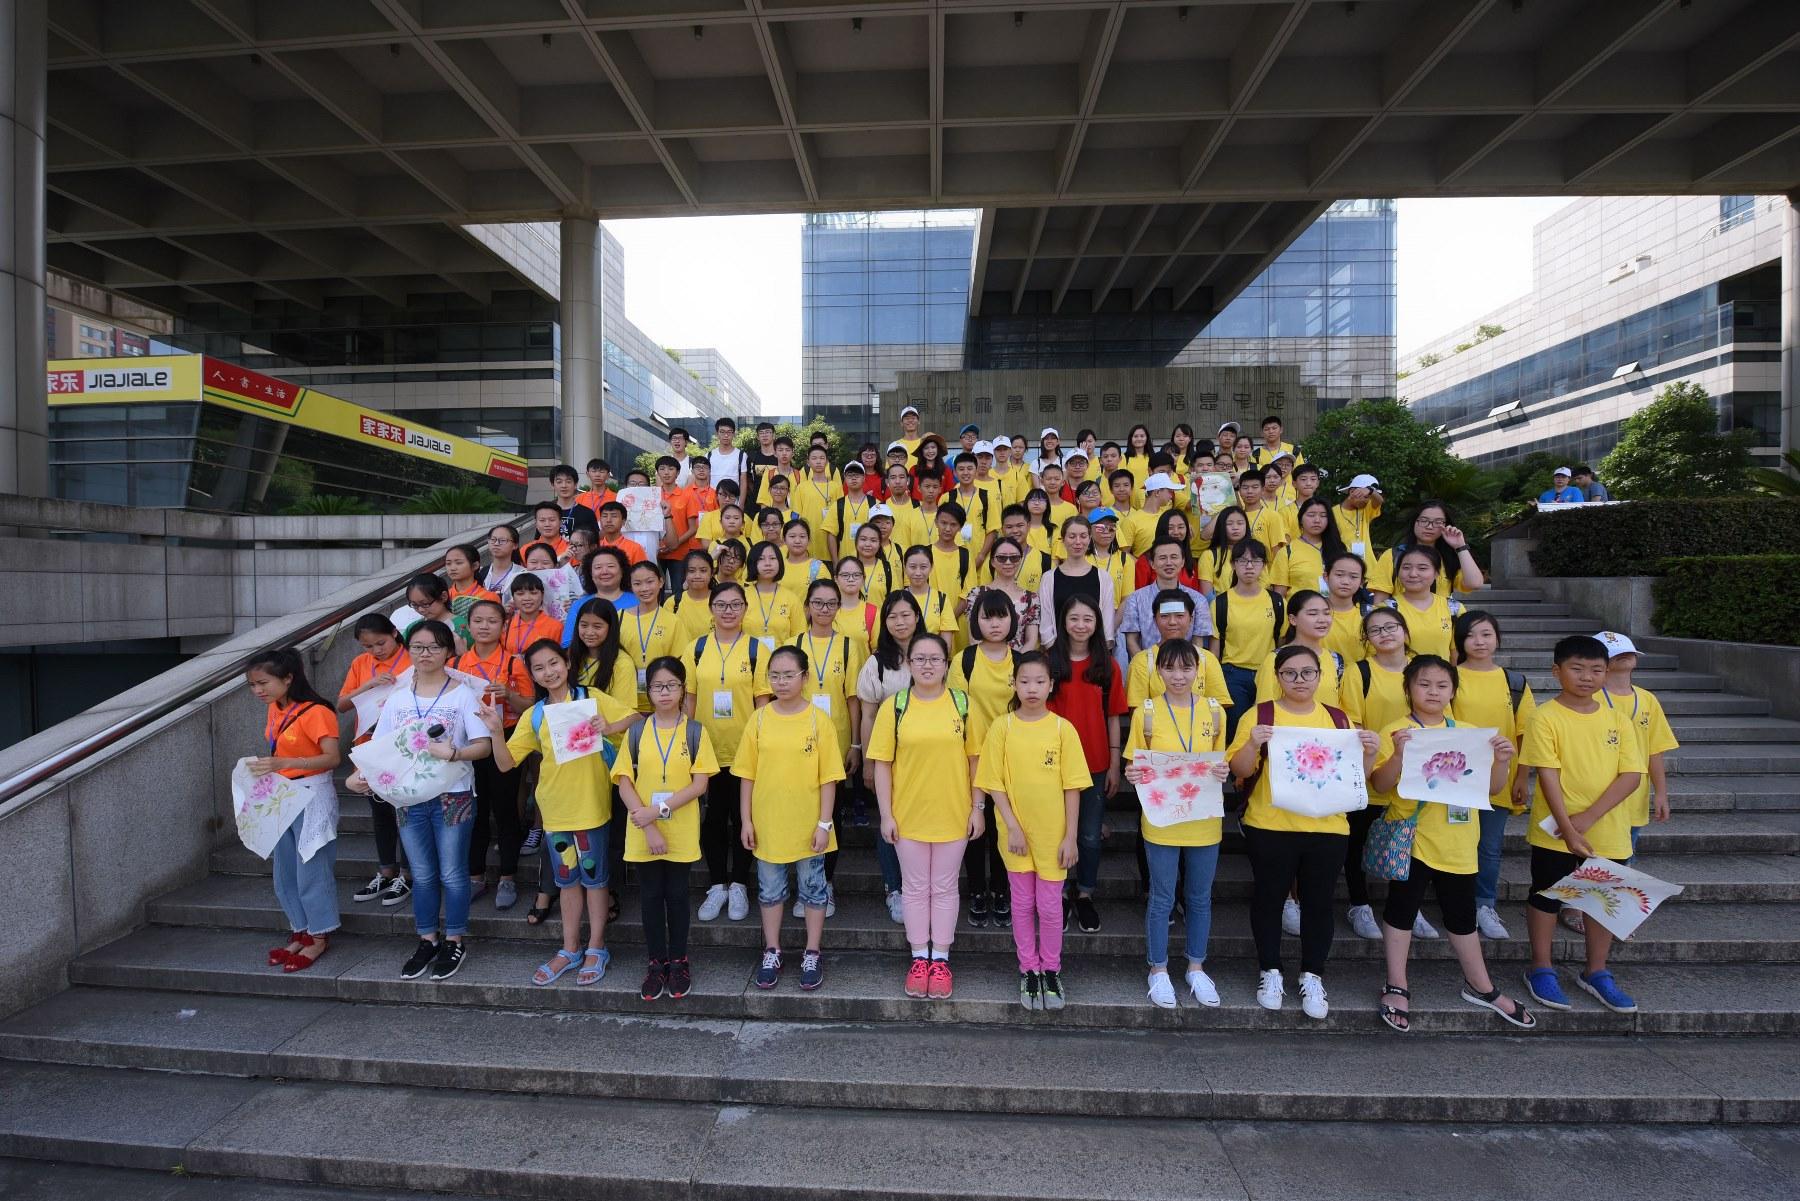 http://www.npc.edu.hk/sites/default/files/dsc_8179.jpg